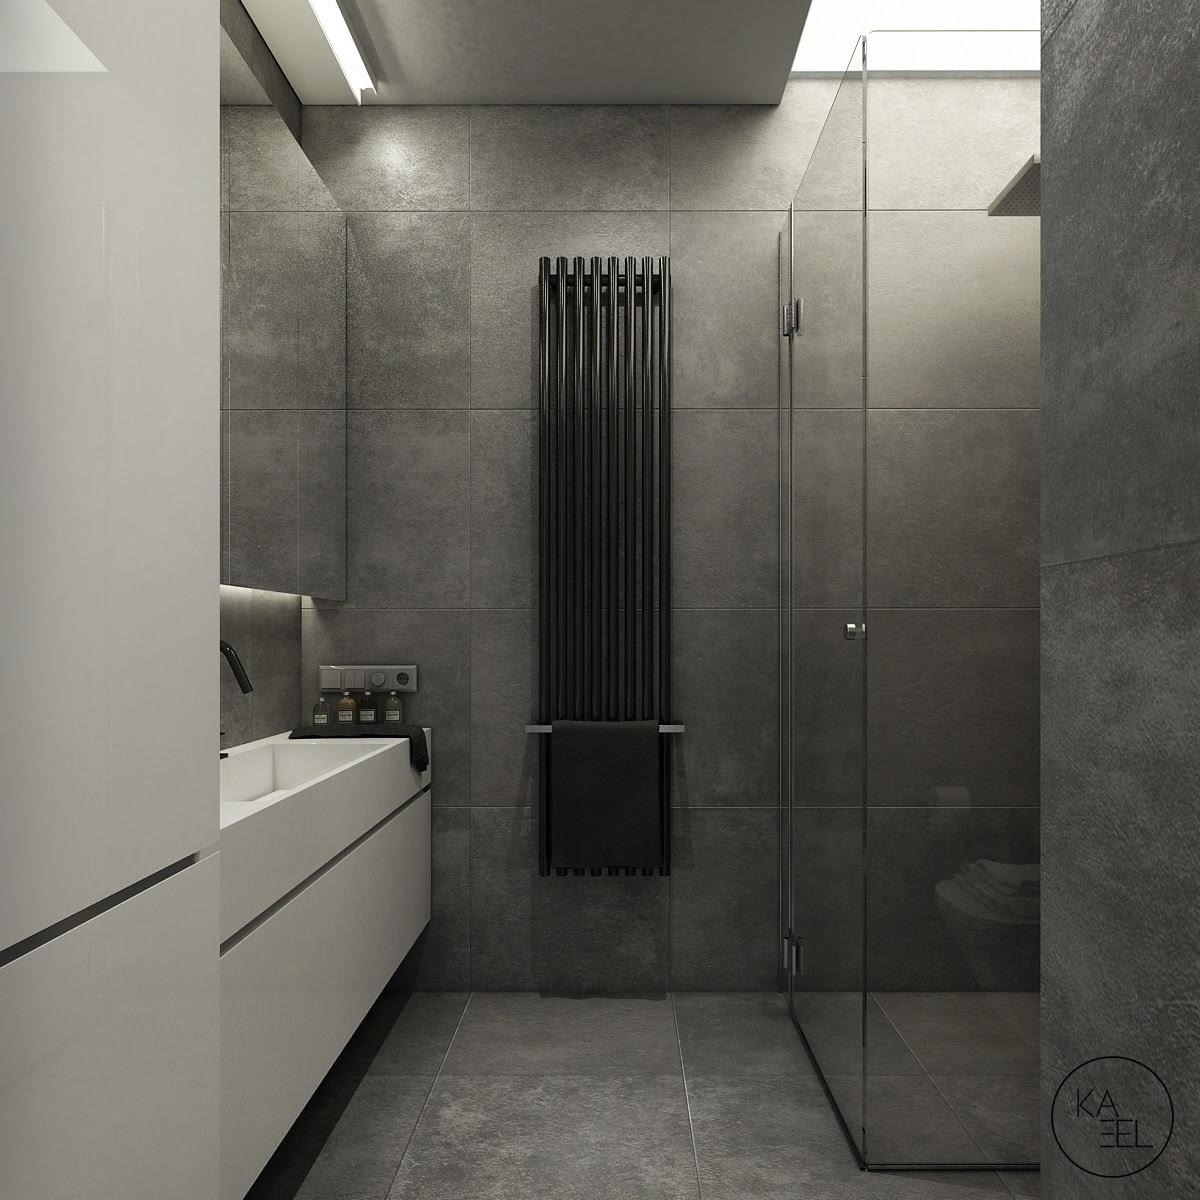   slate-tile-bathroomInterior Design Ideas.